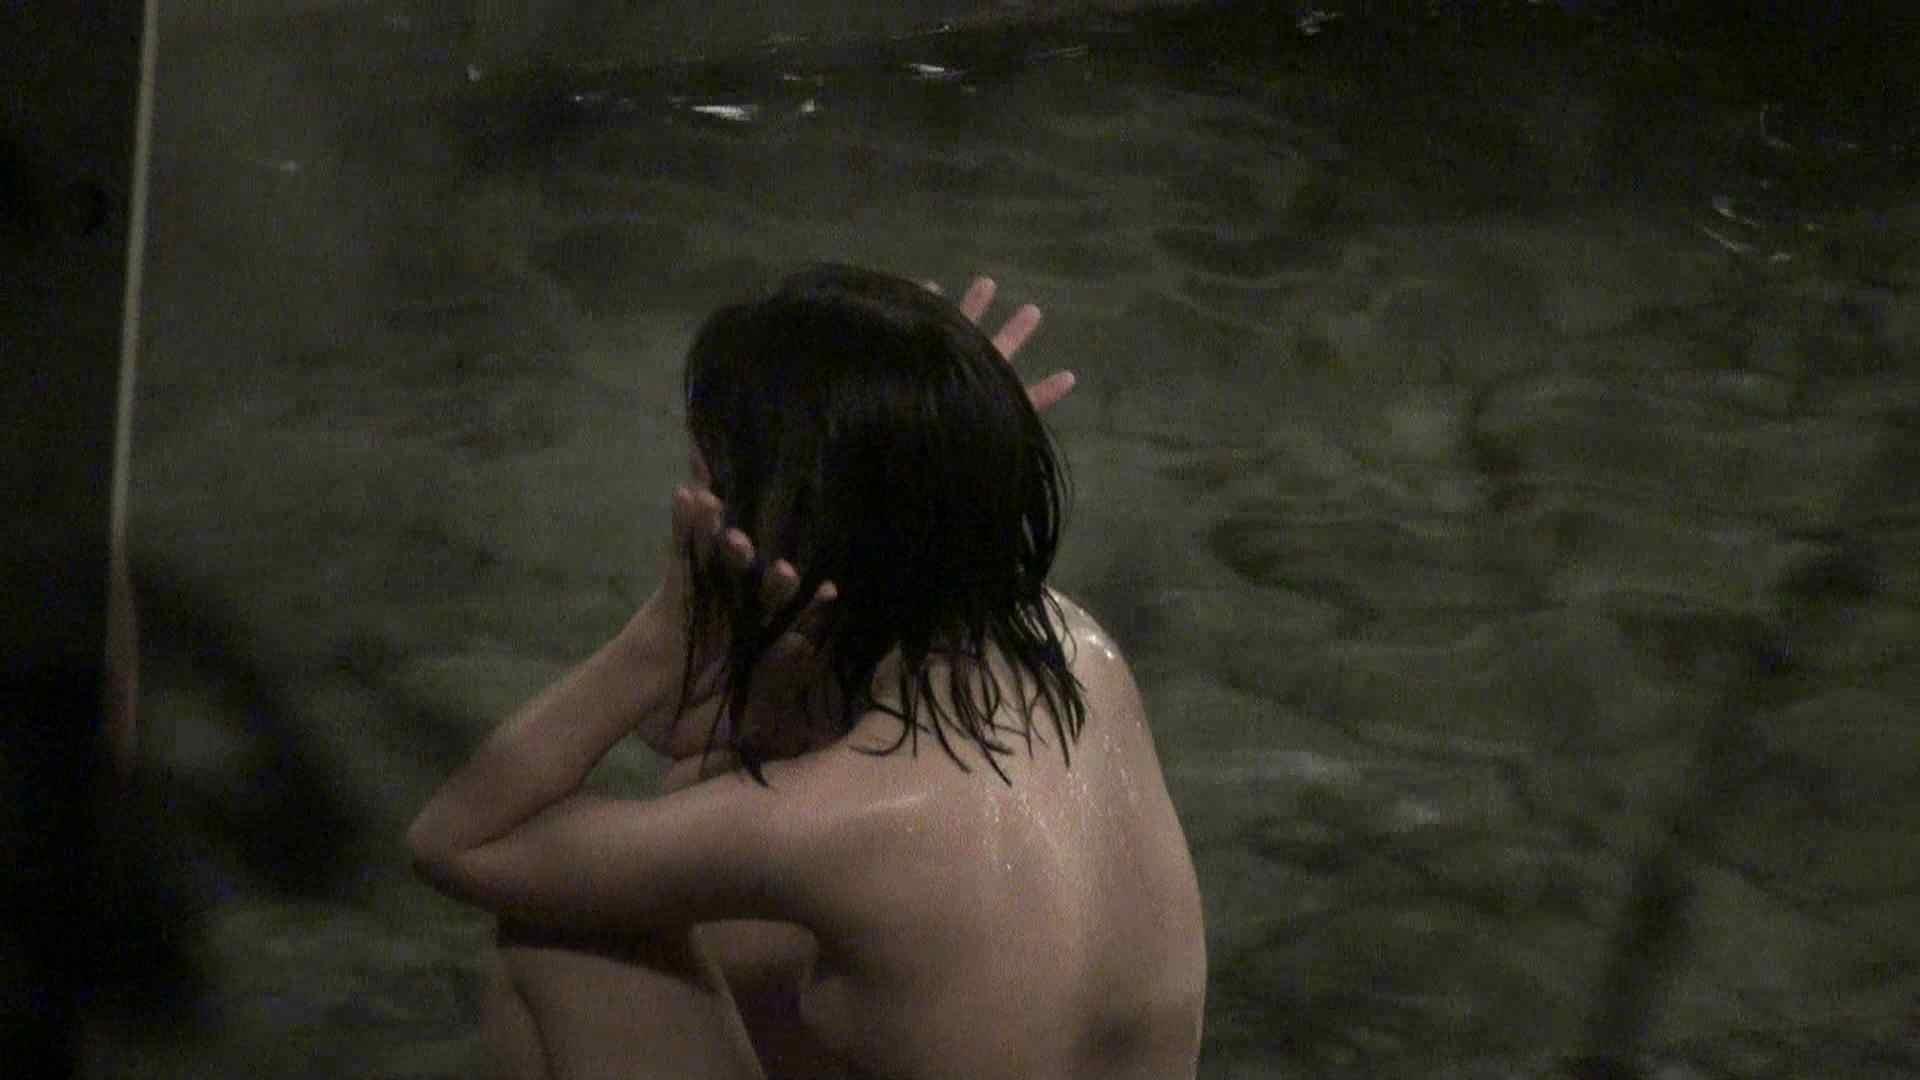 Aquaな露天風呂Vol.363 盗撮 | OLセックス  90画像 31